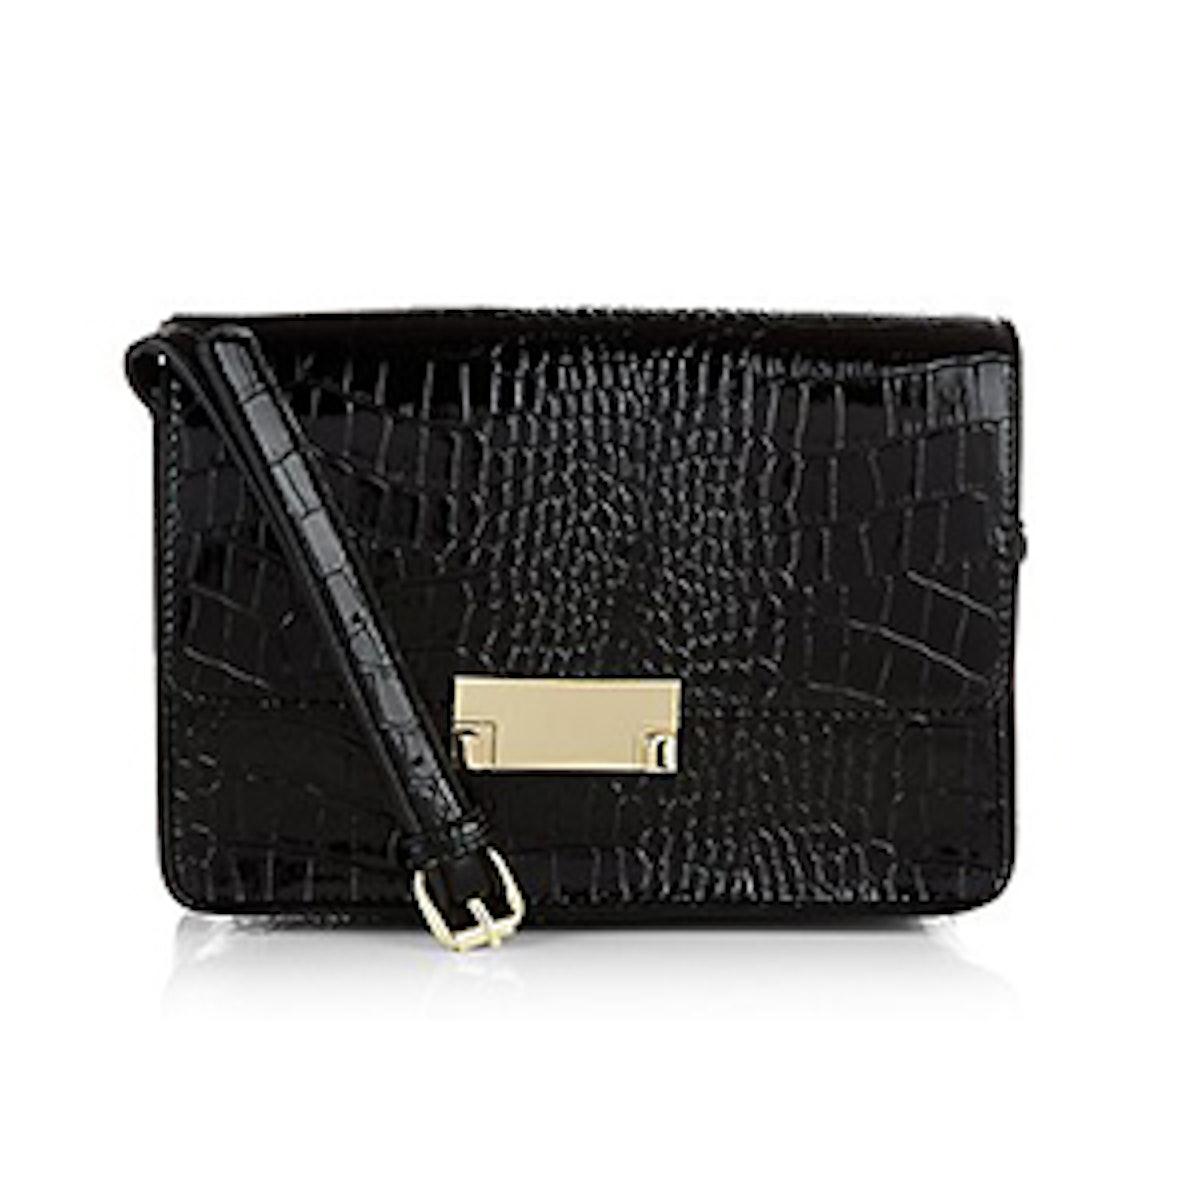 Black Croc Textured Mini Across Body Bag